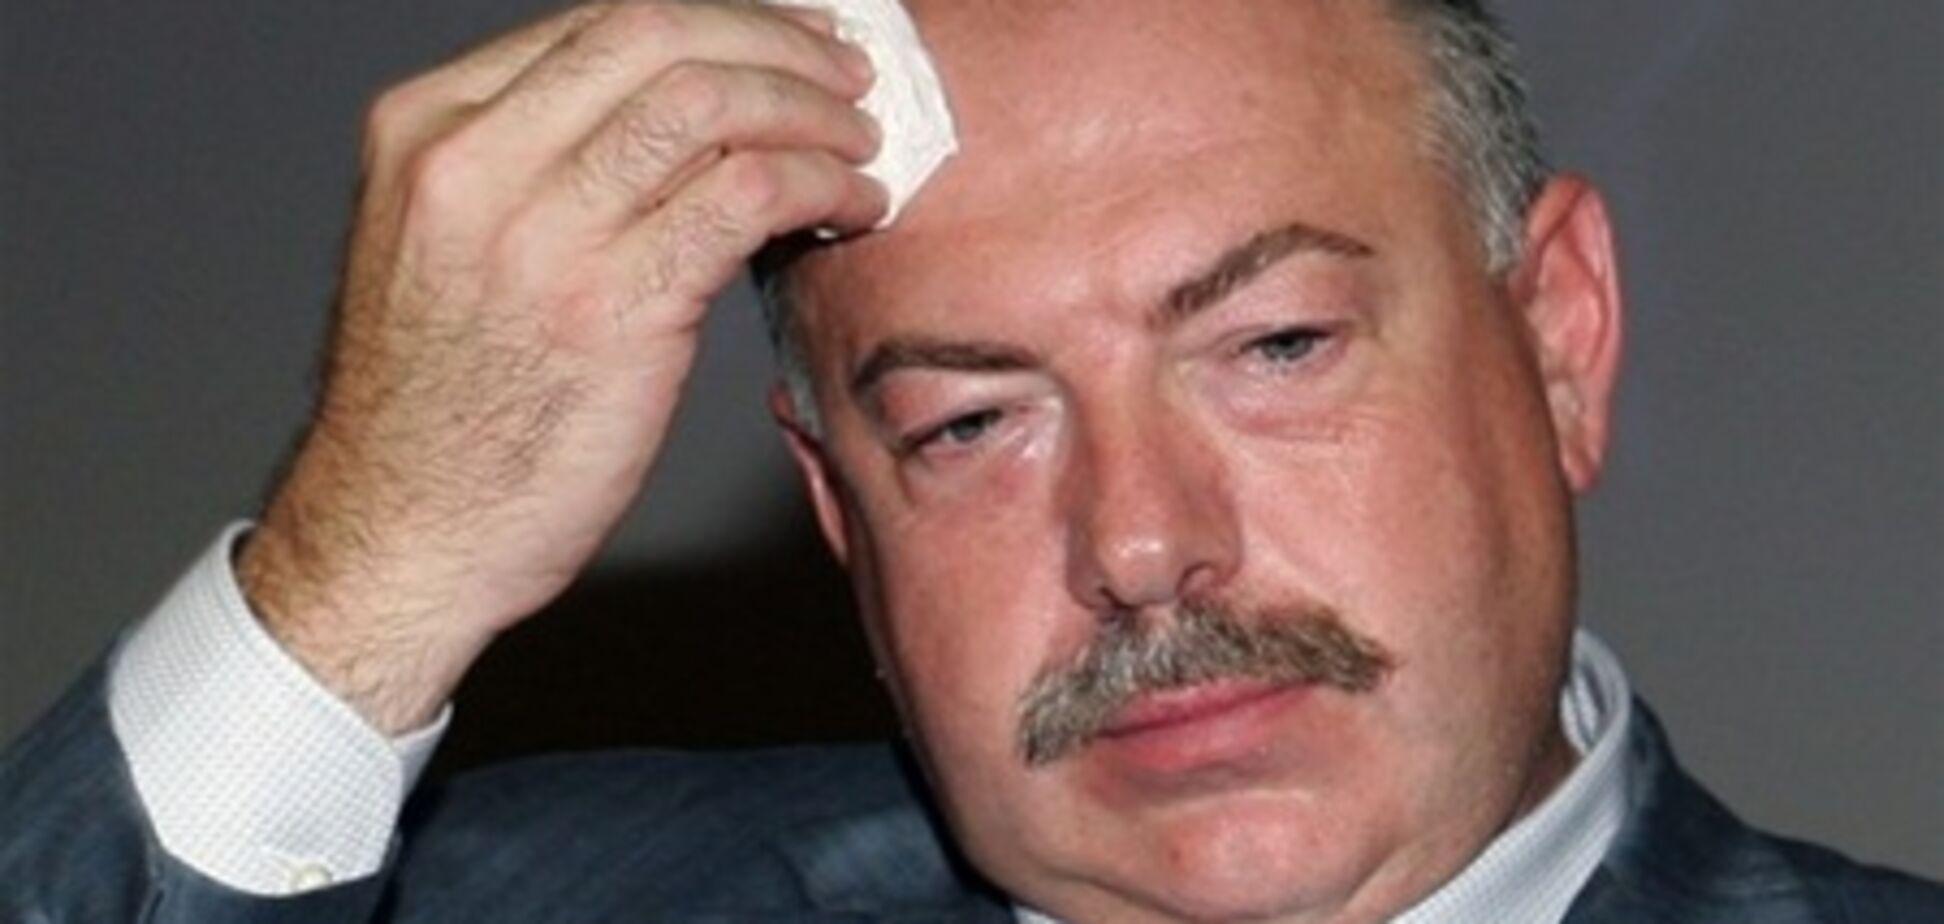 Прокуратура обжаловала приговор экс-председателю райгосадминистрации Бойчуку